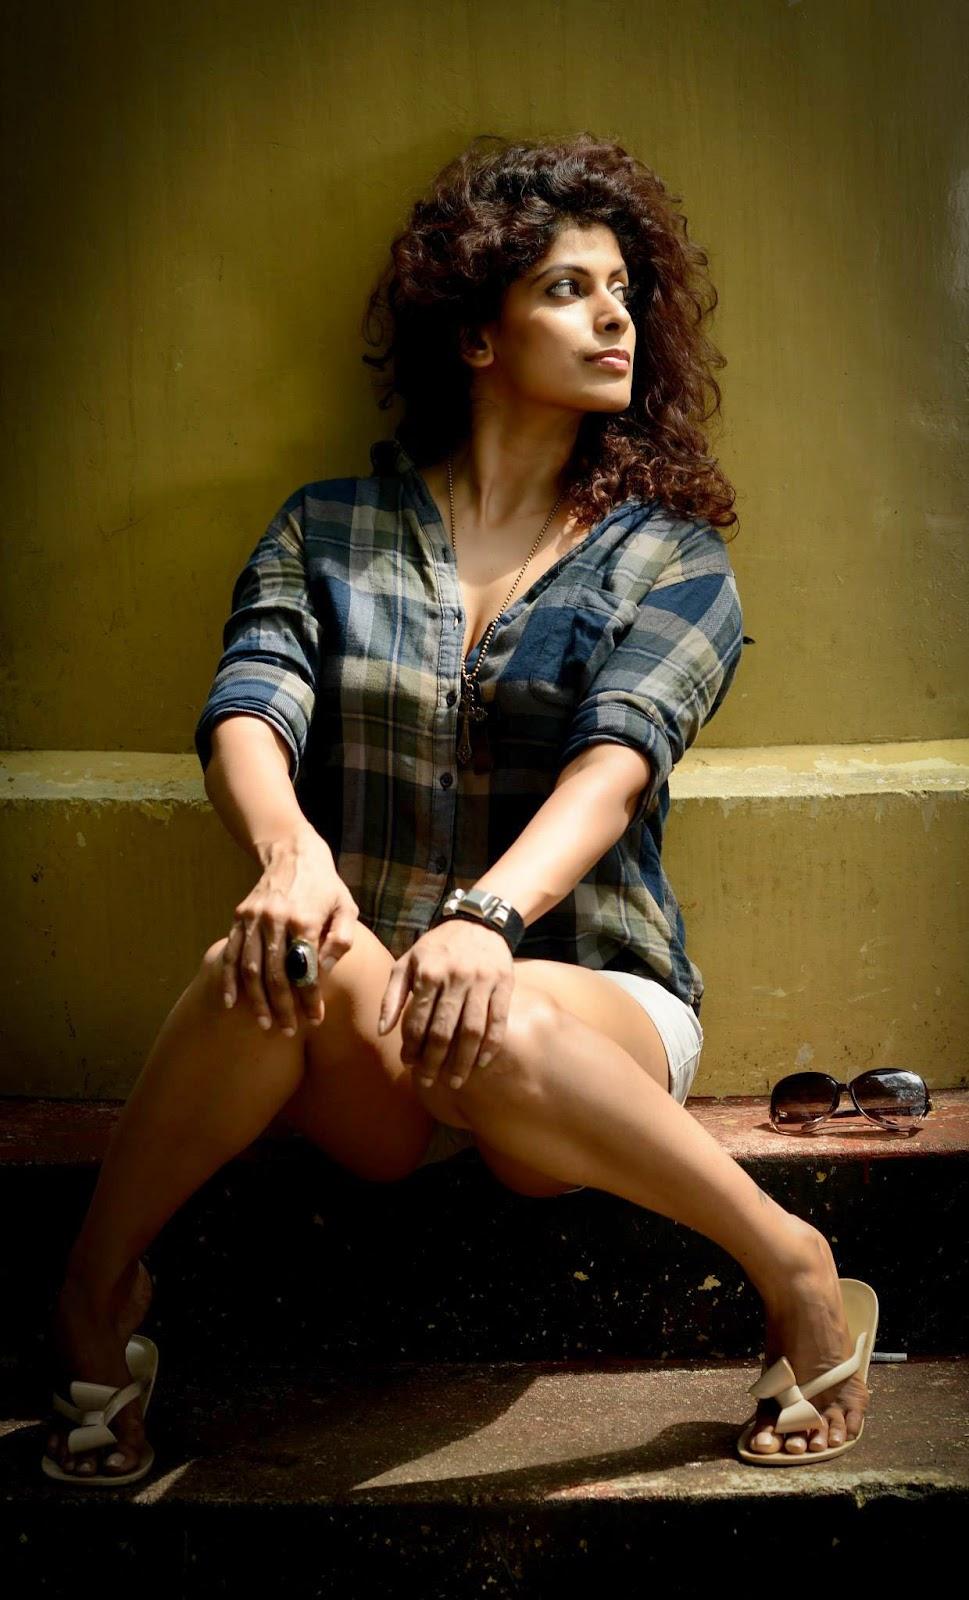 Aish Athukoralage sexy